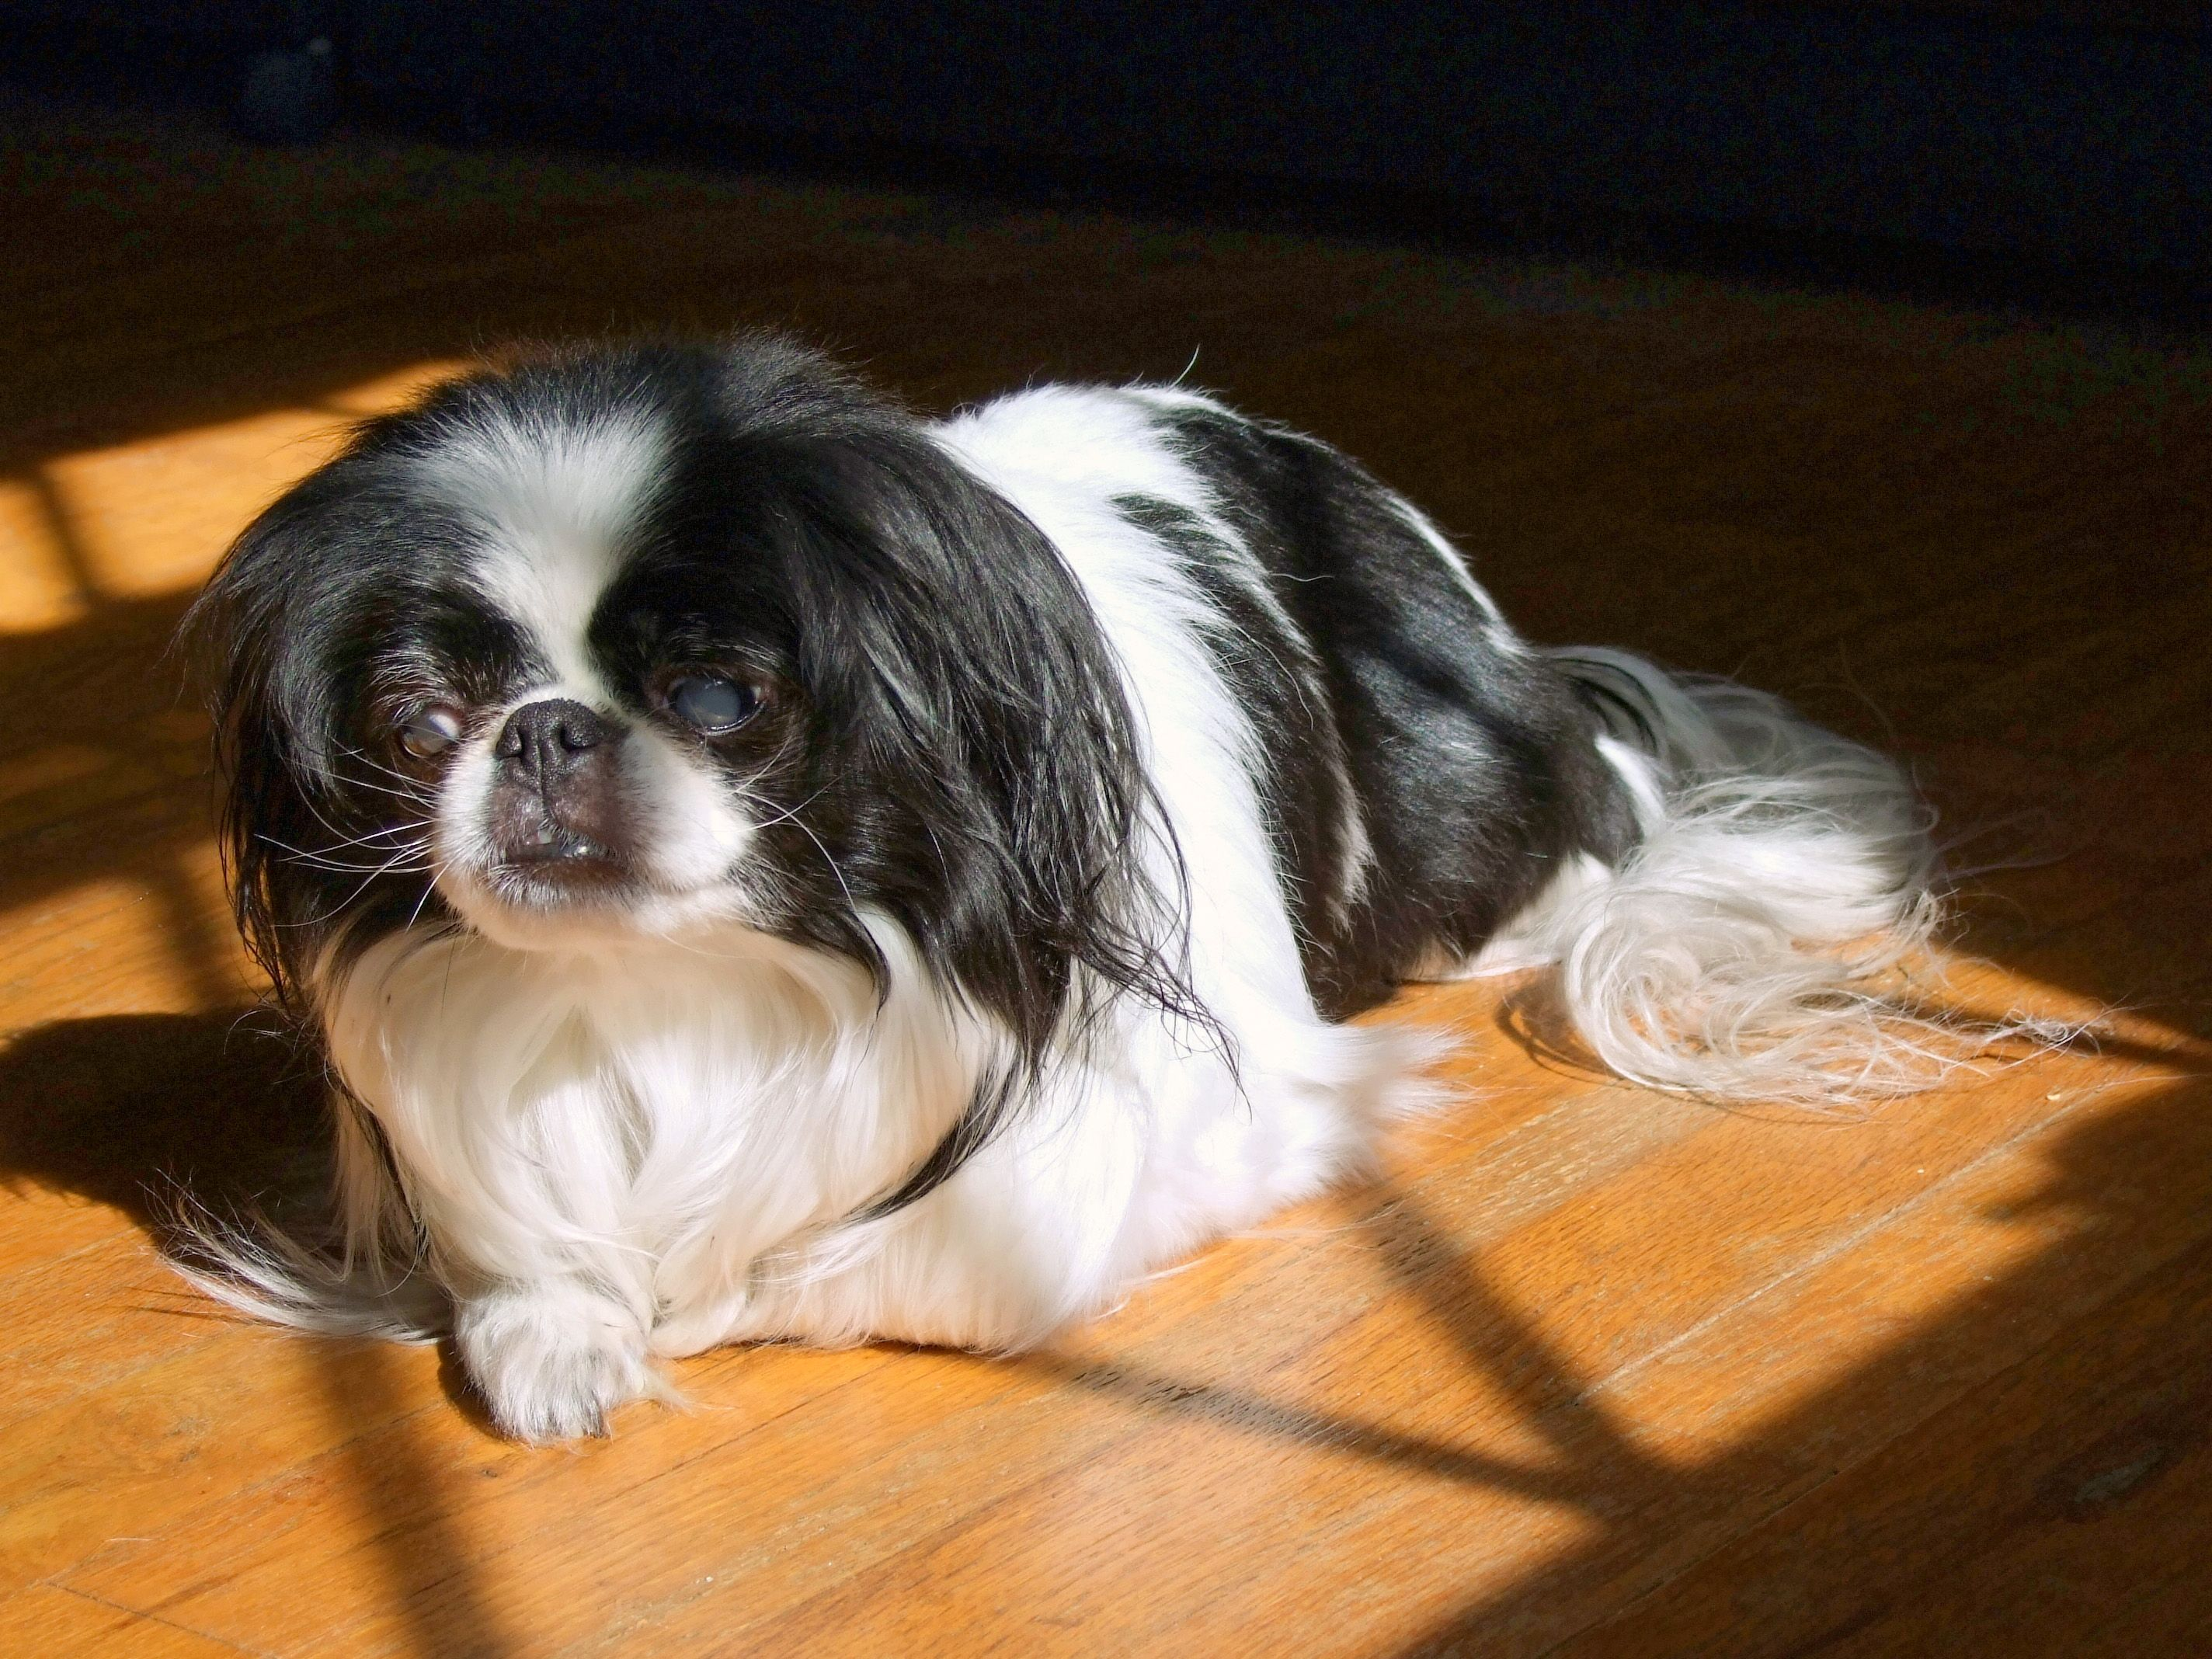 Katie Katsura Hime 10 24 97 1 27 13 Japanese Chin Cute Puppies Chin